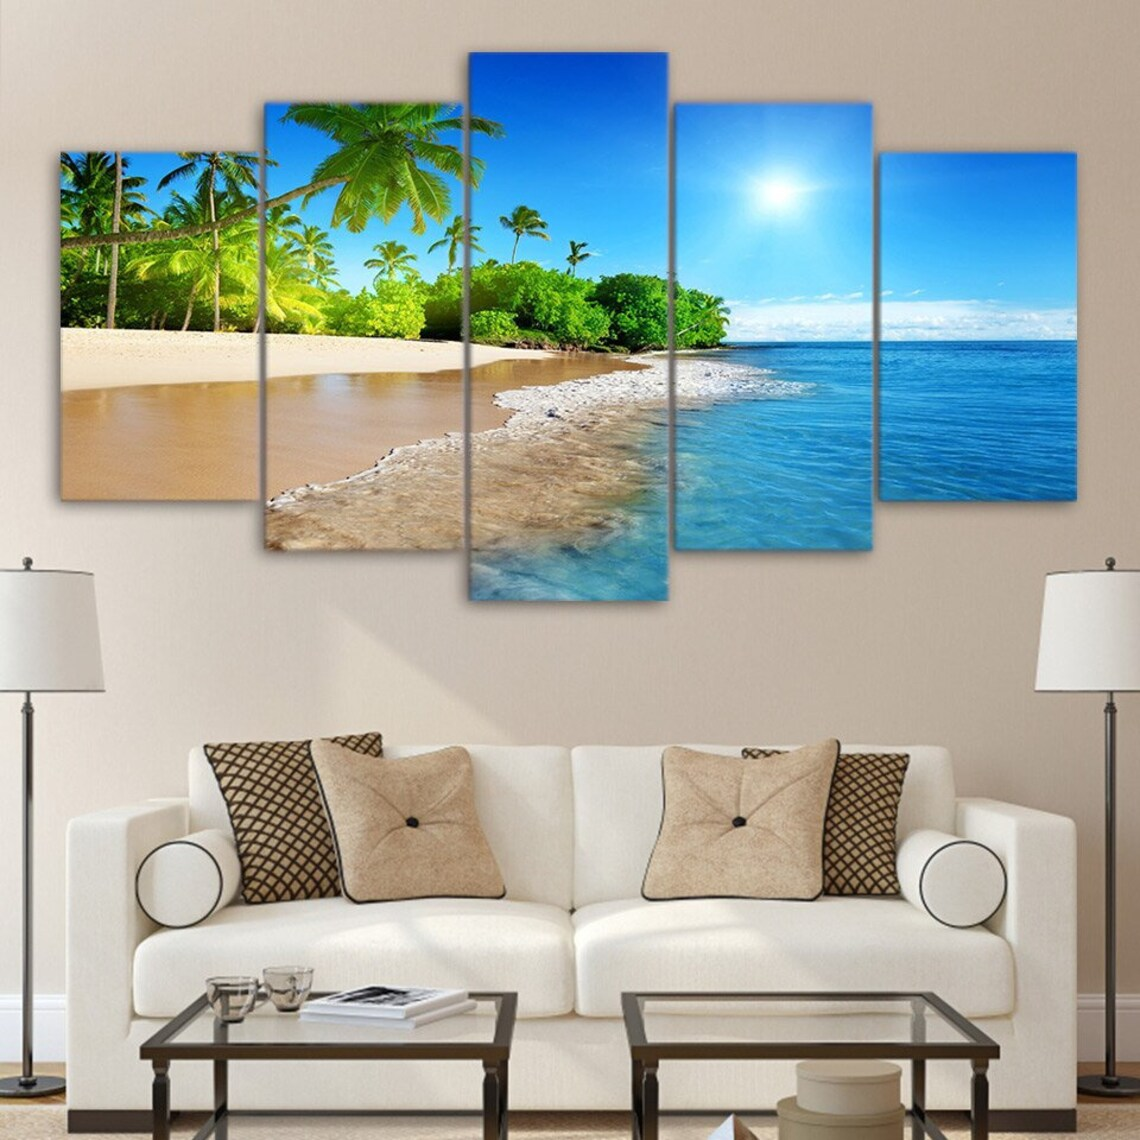 Tropical Beach Caribbean Vacation Landscape 5 Piece Five Panel Canvas Wall Art